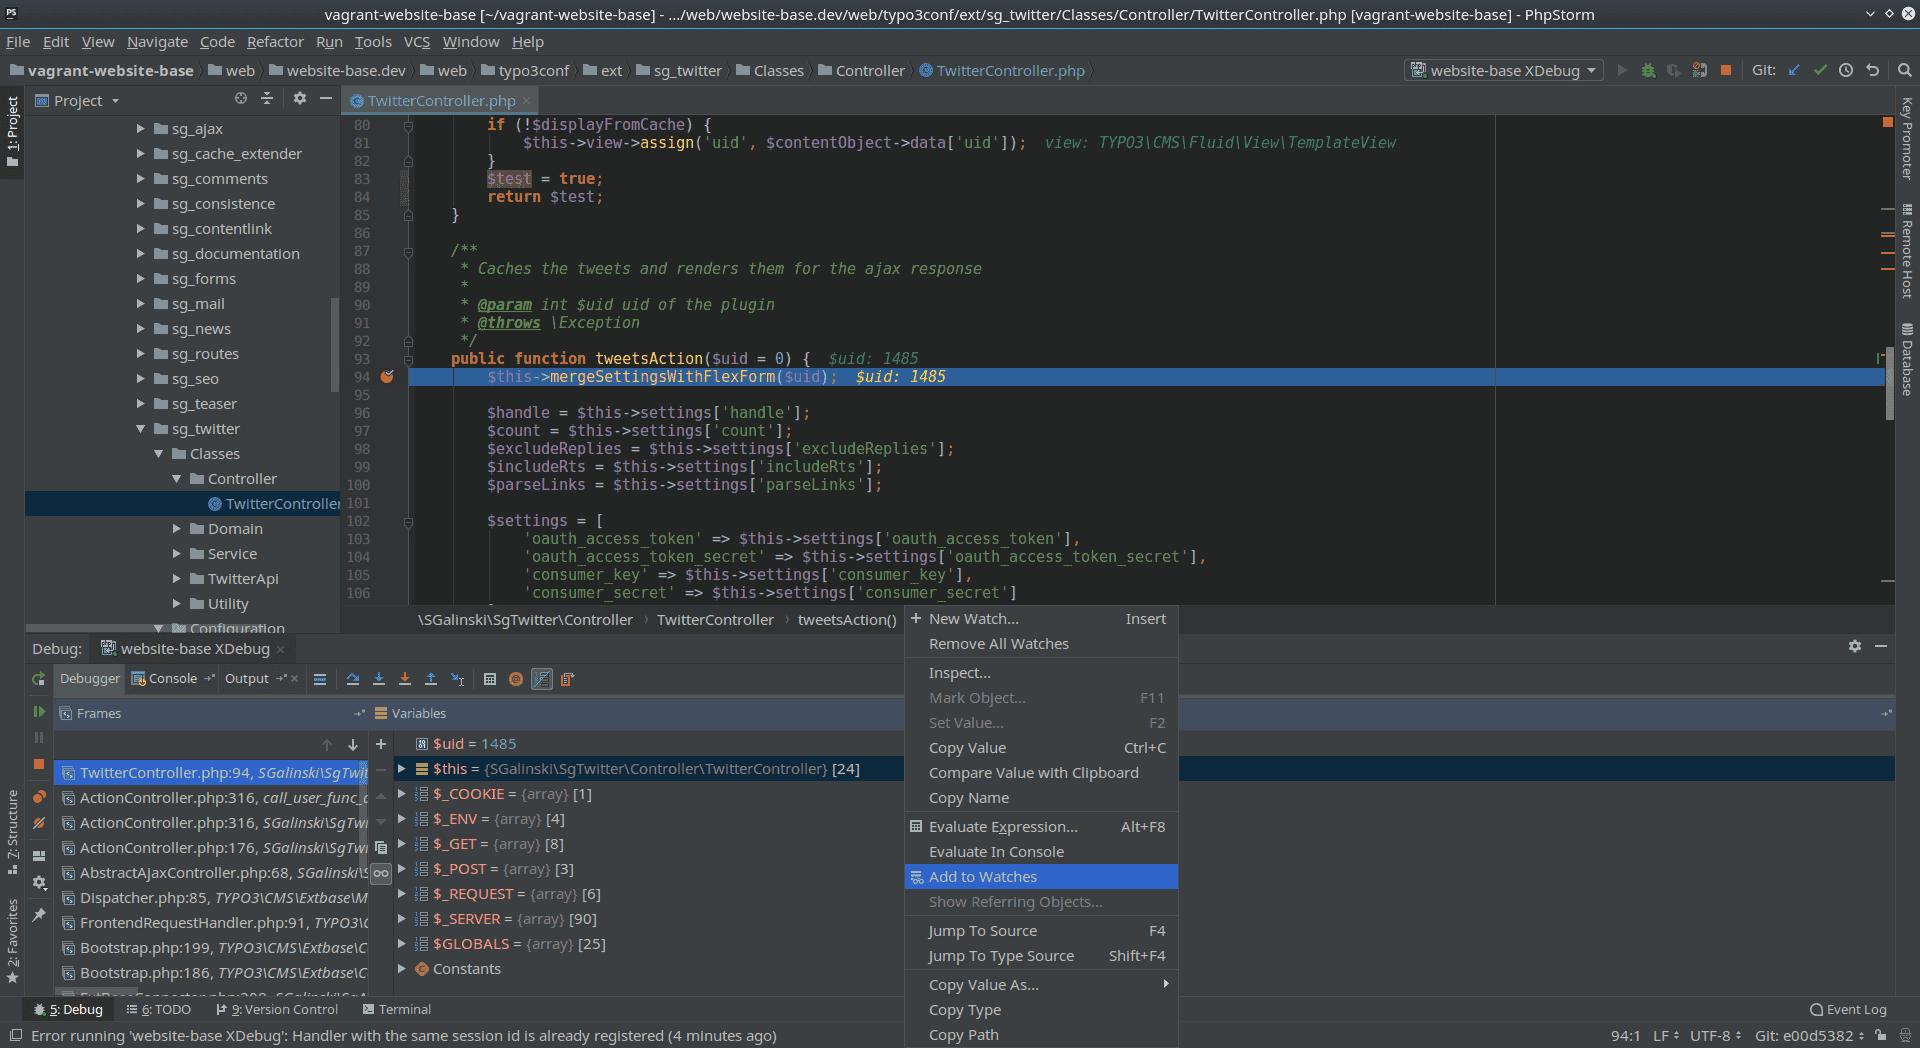 PhpStorm: An IDE for TYPO3? - sgalinski